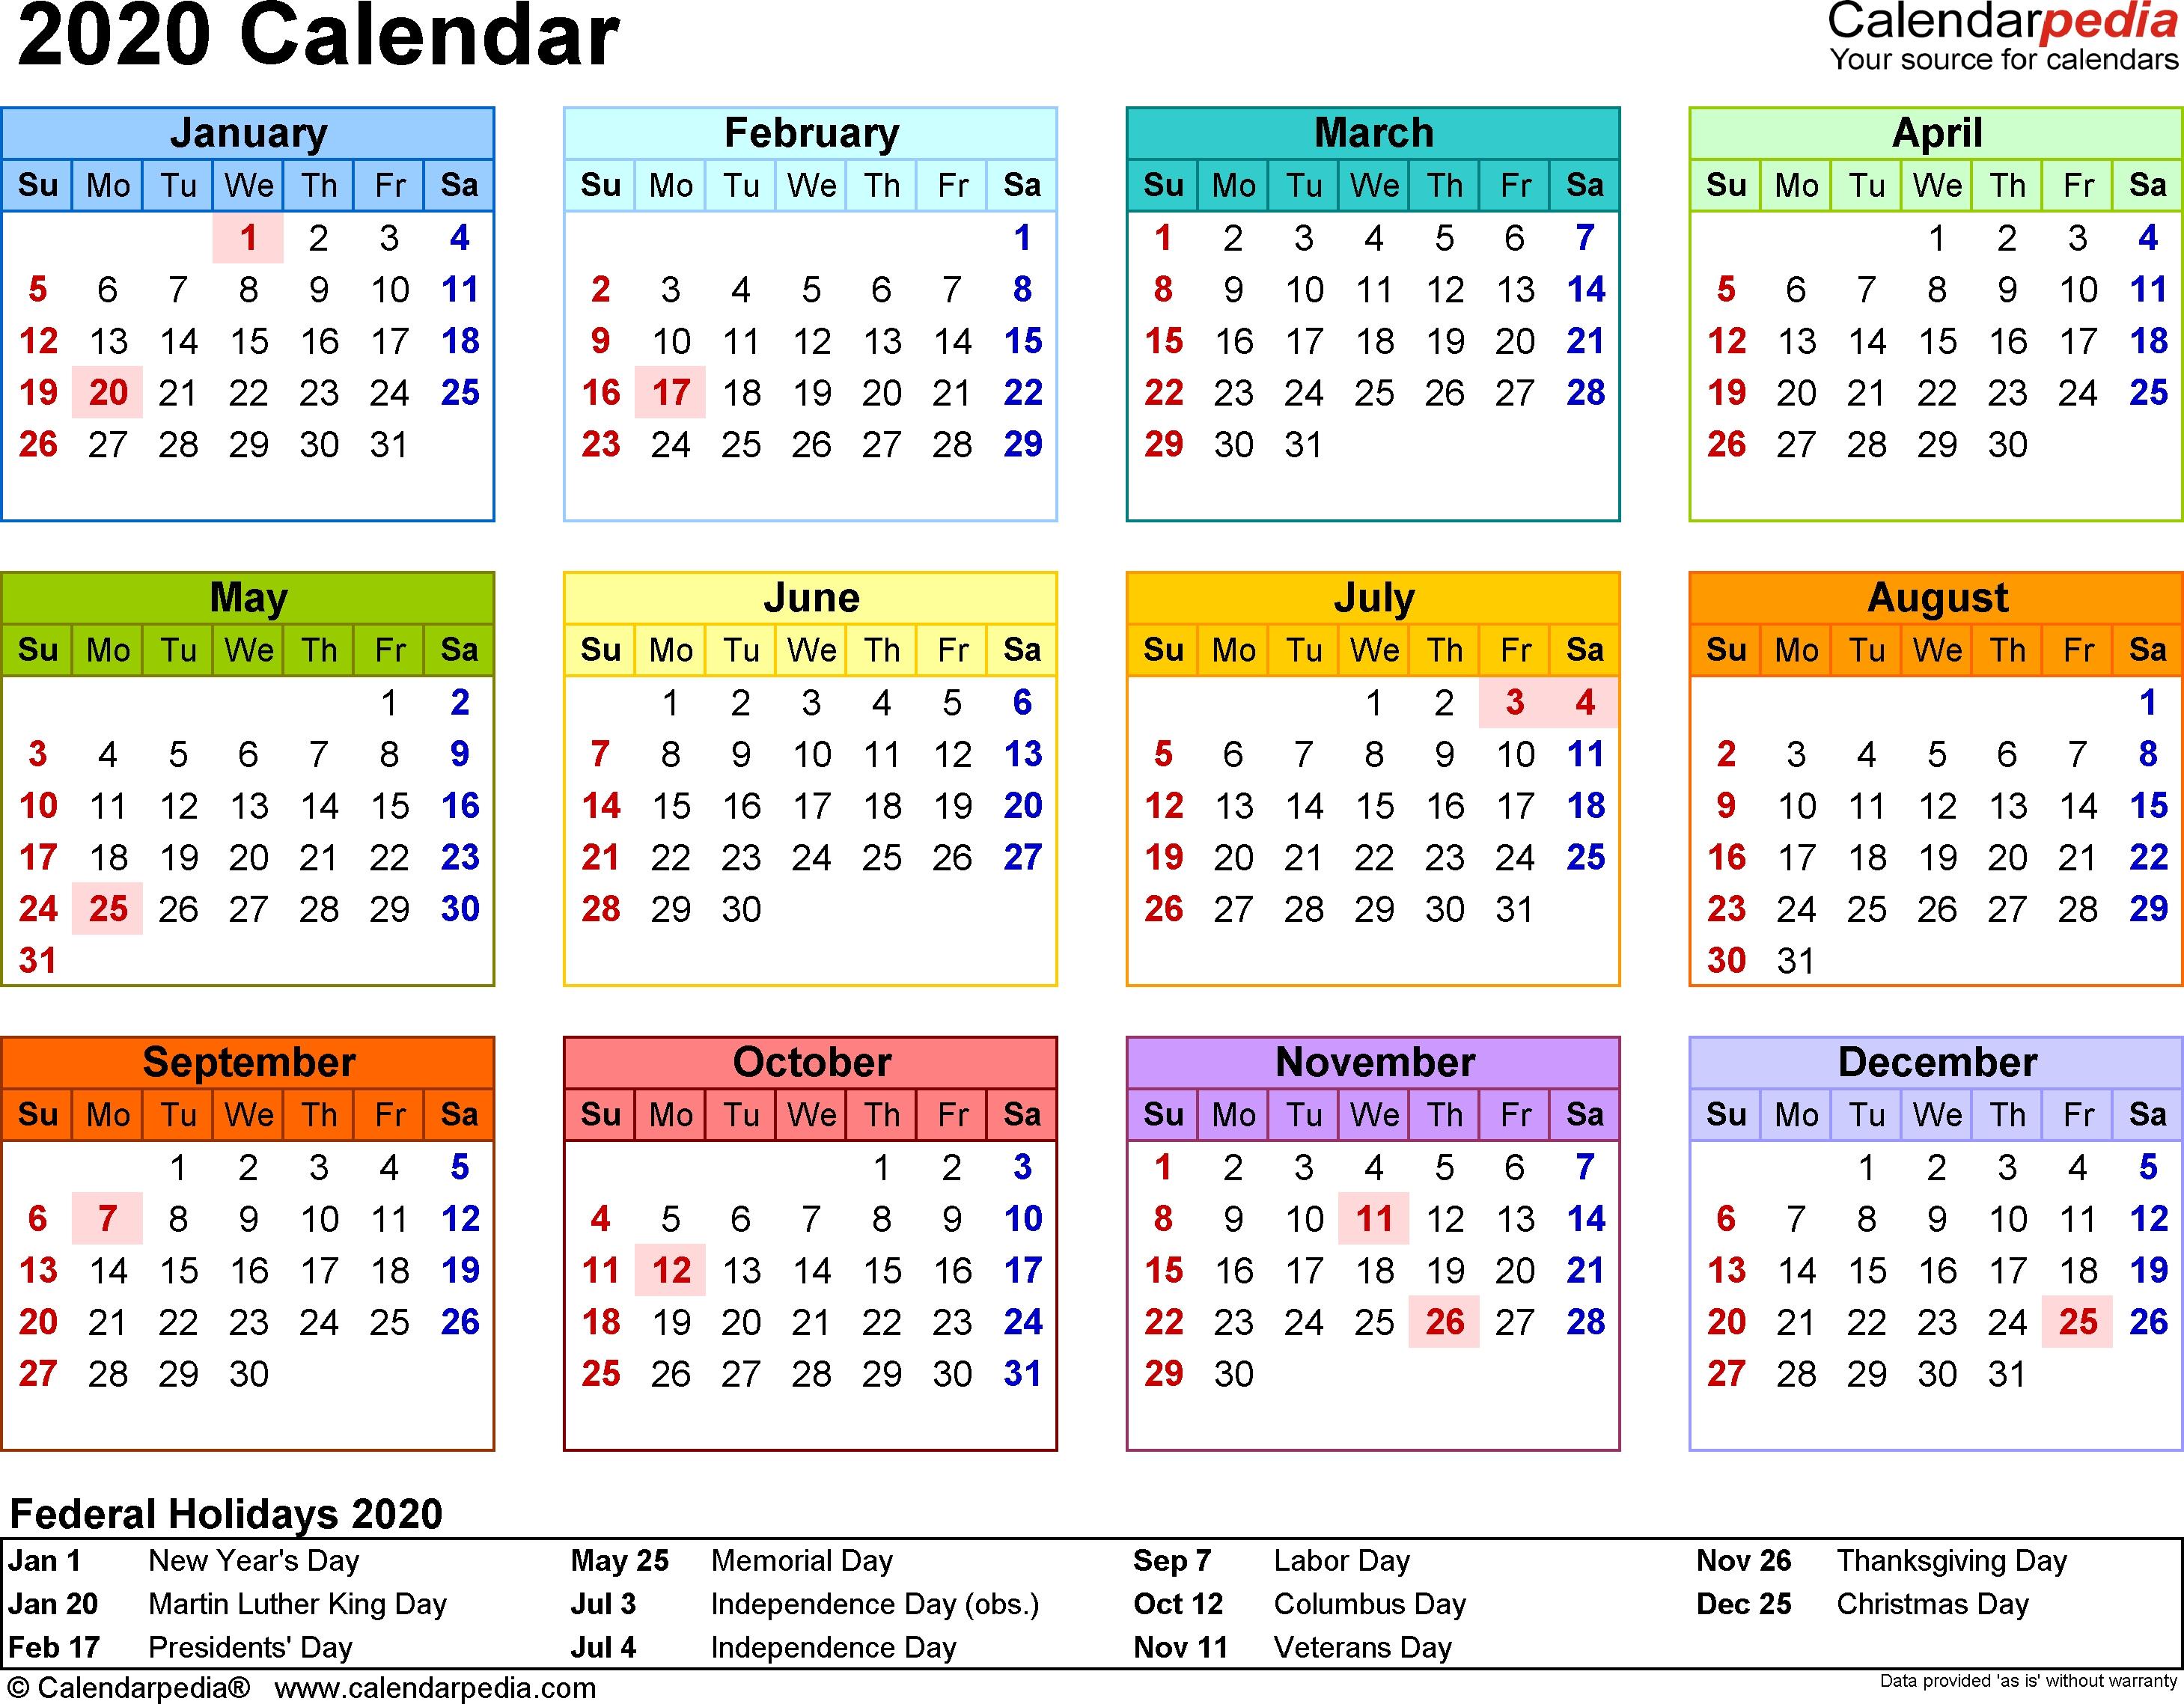 2020 Calendar - Download 18 Free Printable Excel Templates-Template Monthly Calendar 2020.xls